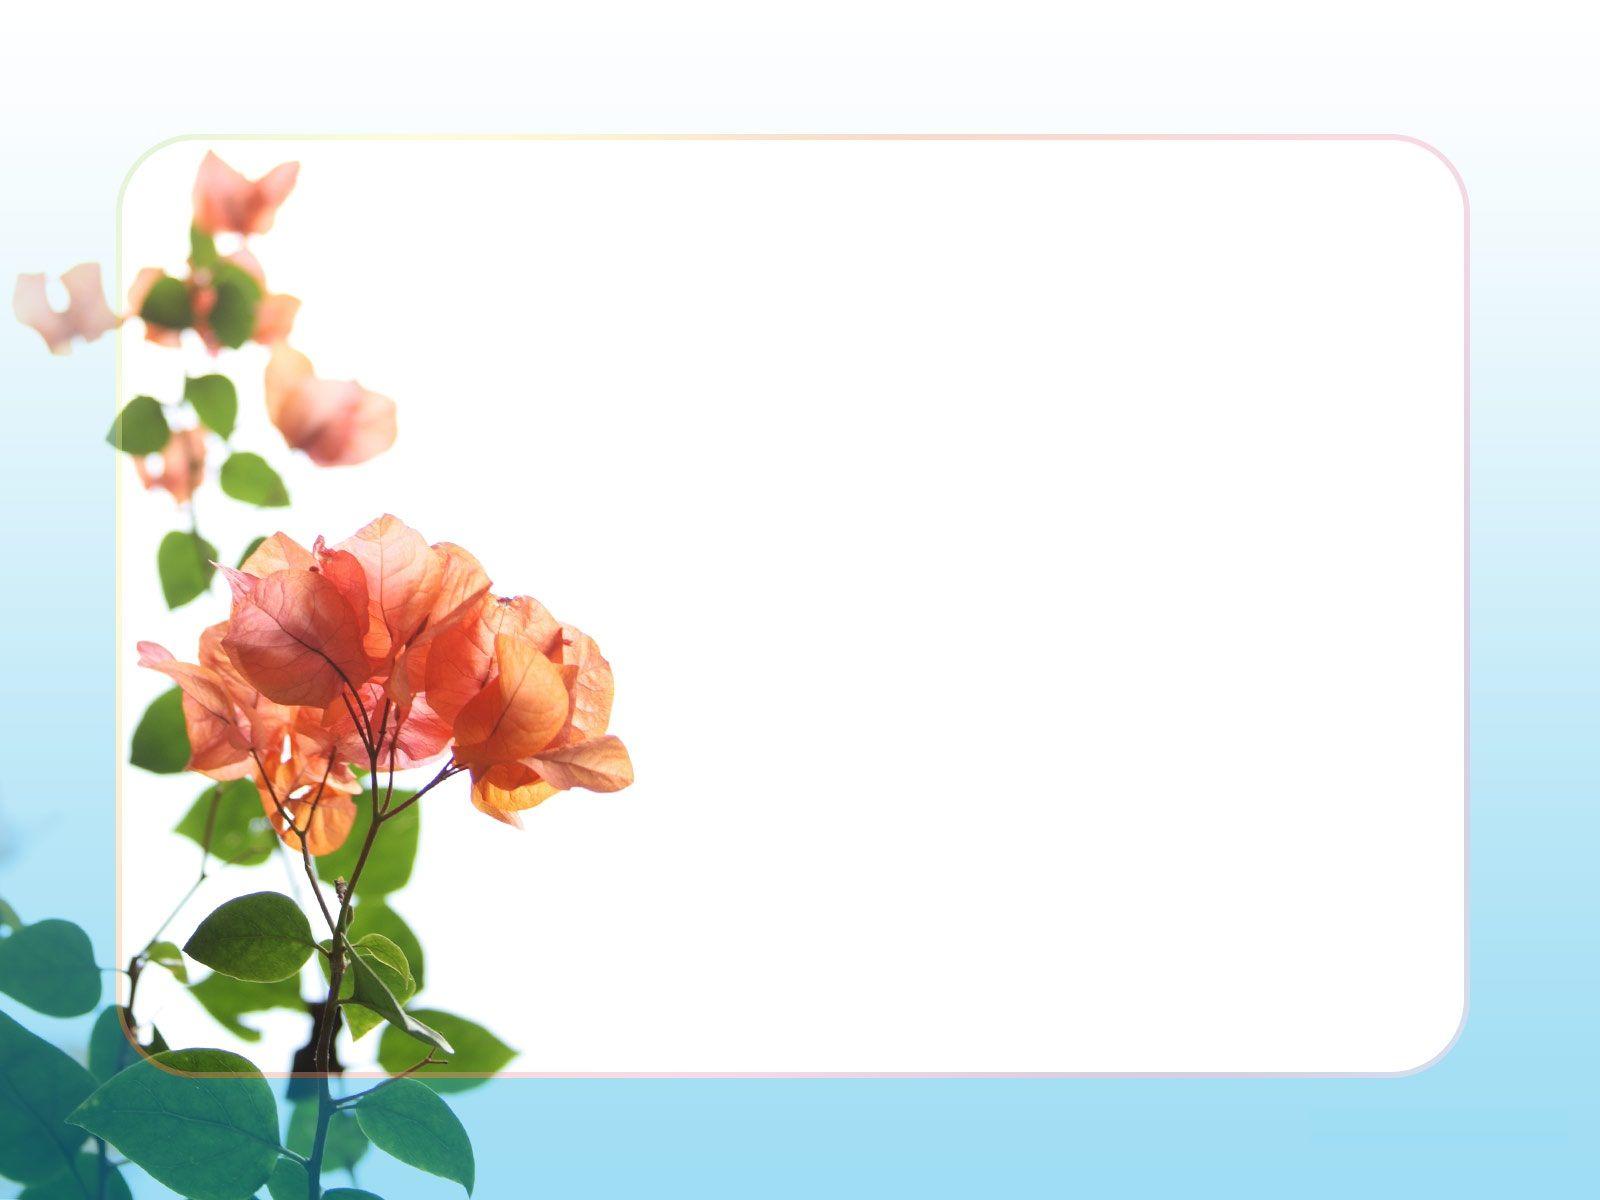 Flower Border Clip Art Hd Background Wallpaper 27 HD Wallpapers.